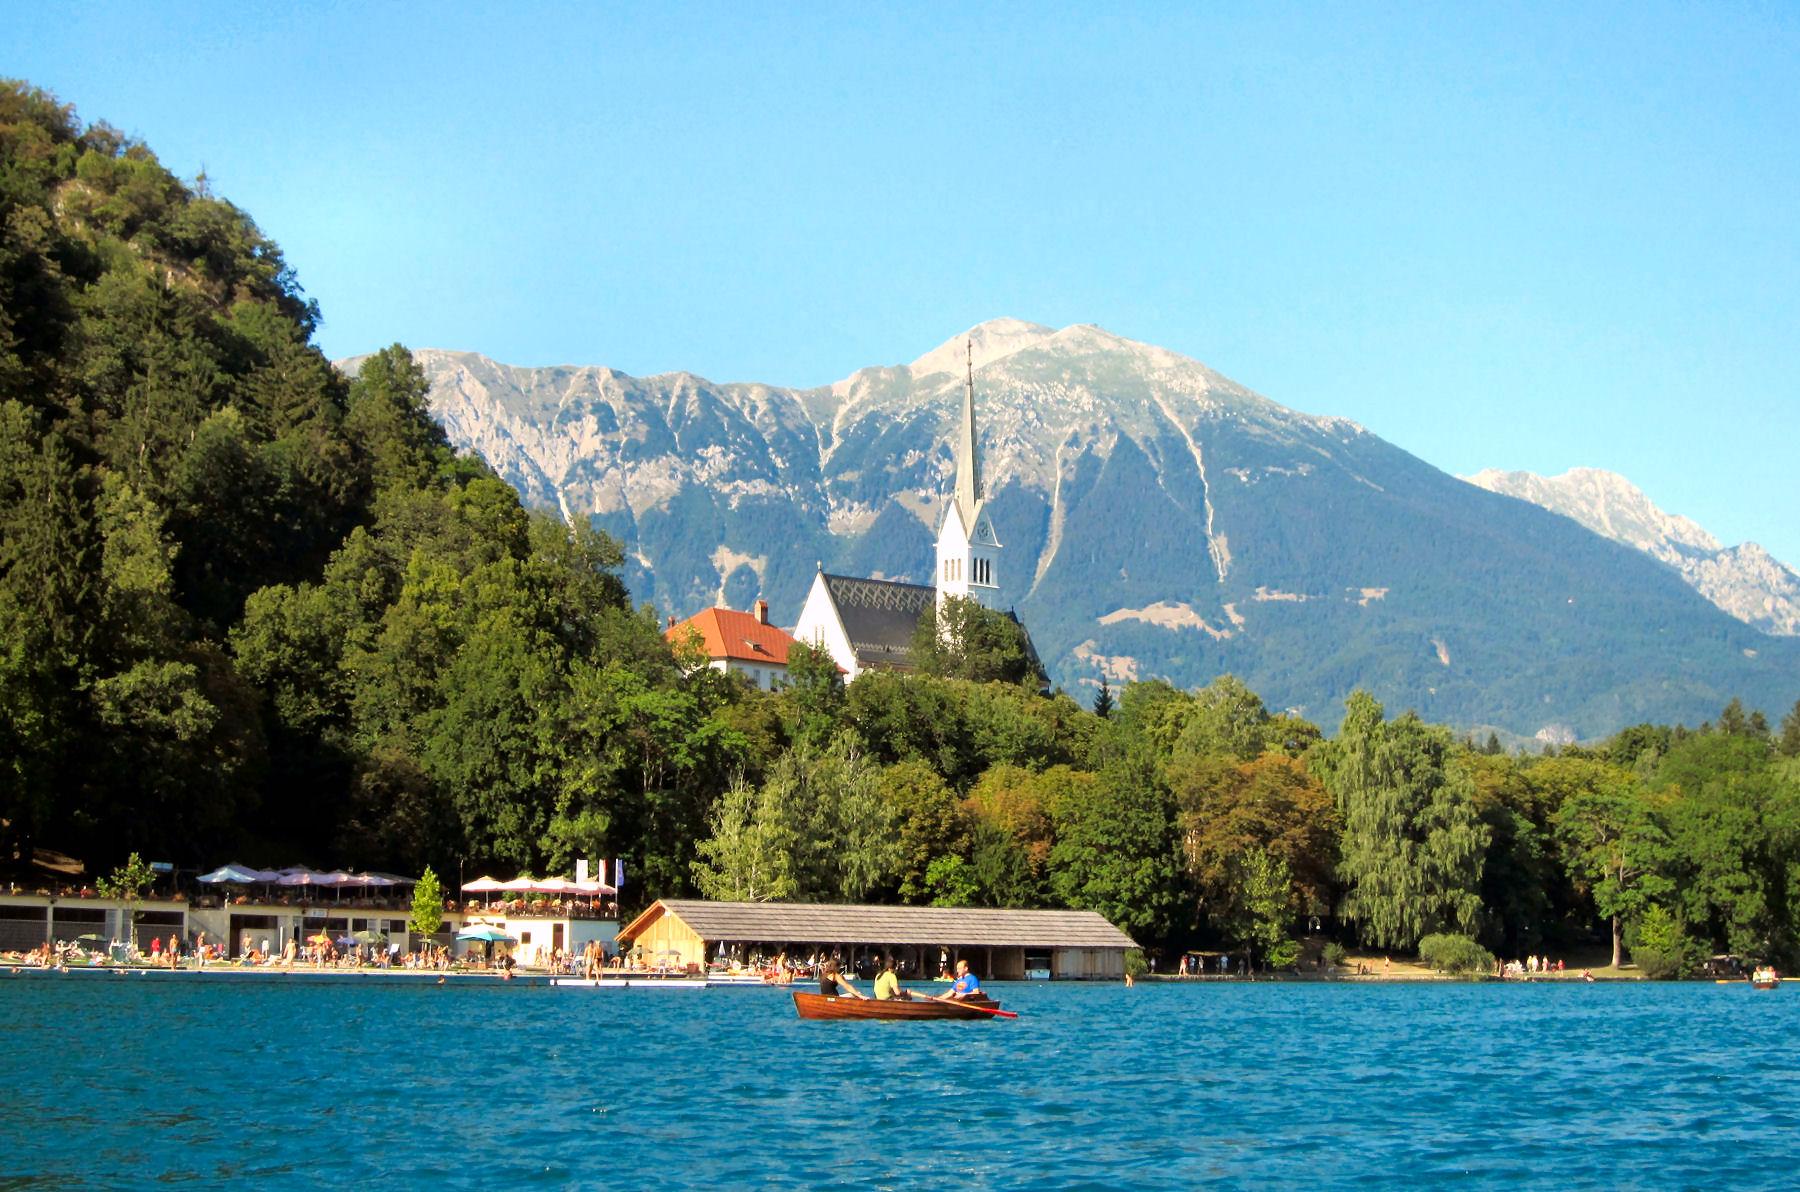 Lake Bled has the longest swimming season of all Alpine resorts